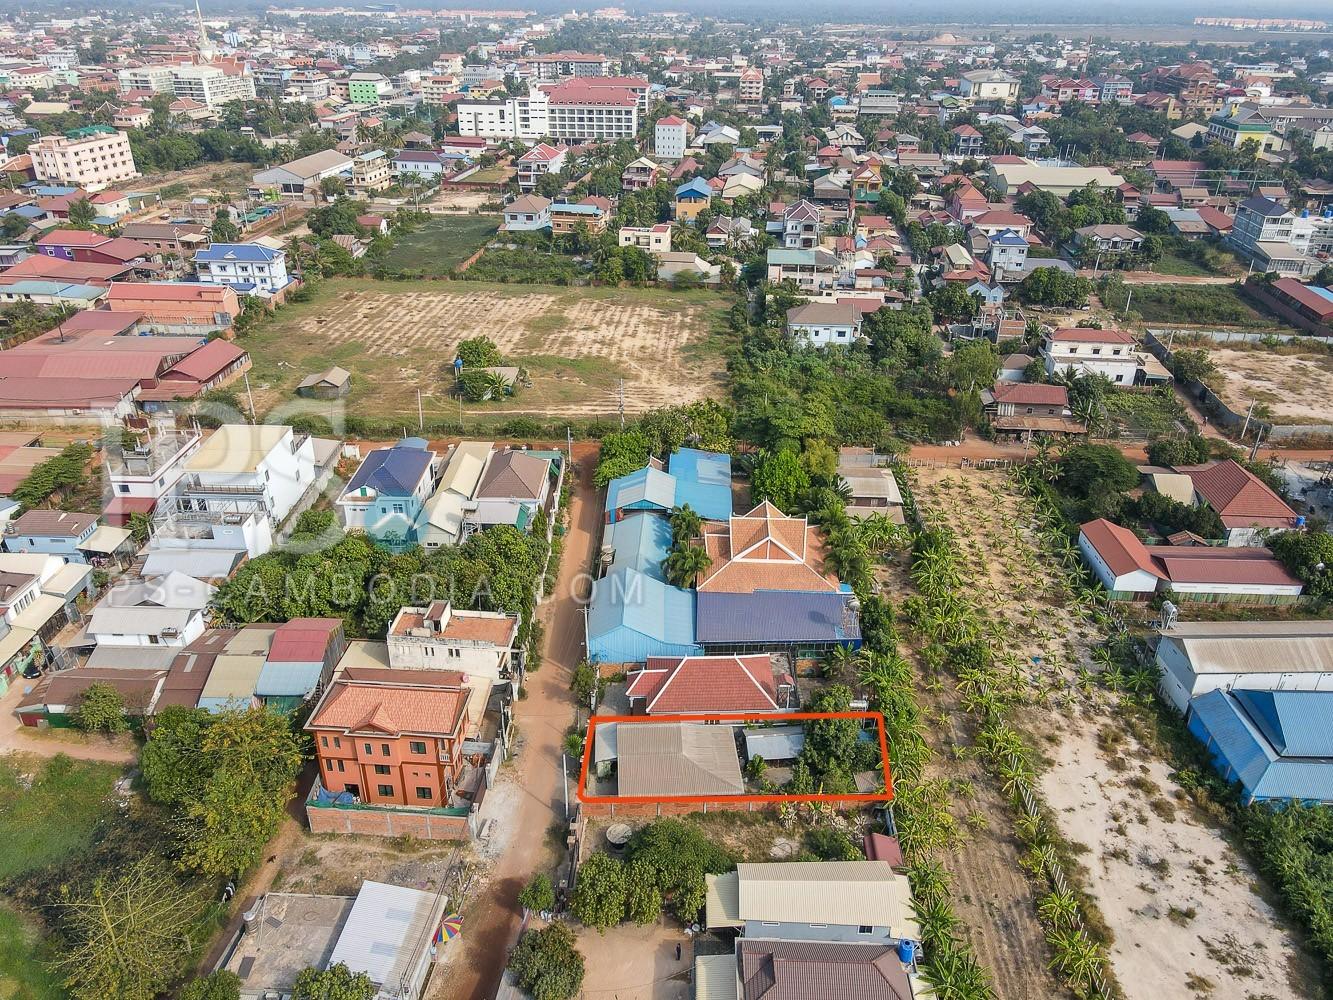 210 Sqm Land For Sale in Sala Kamreuk - Behind Phar Ler Market , Siem Reap